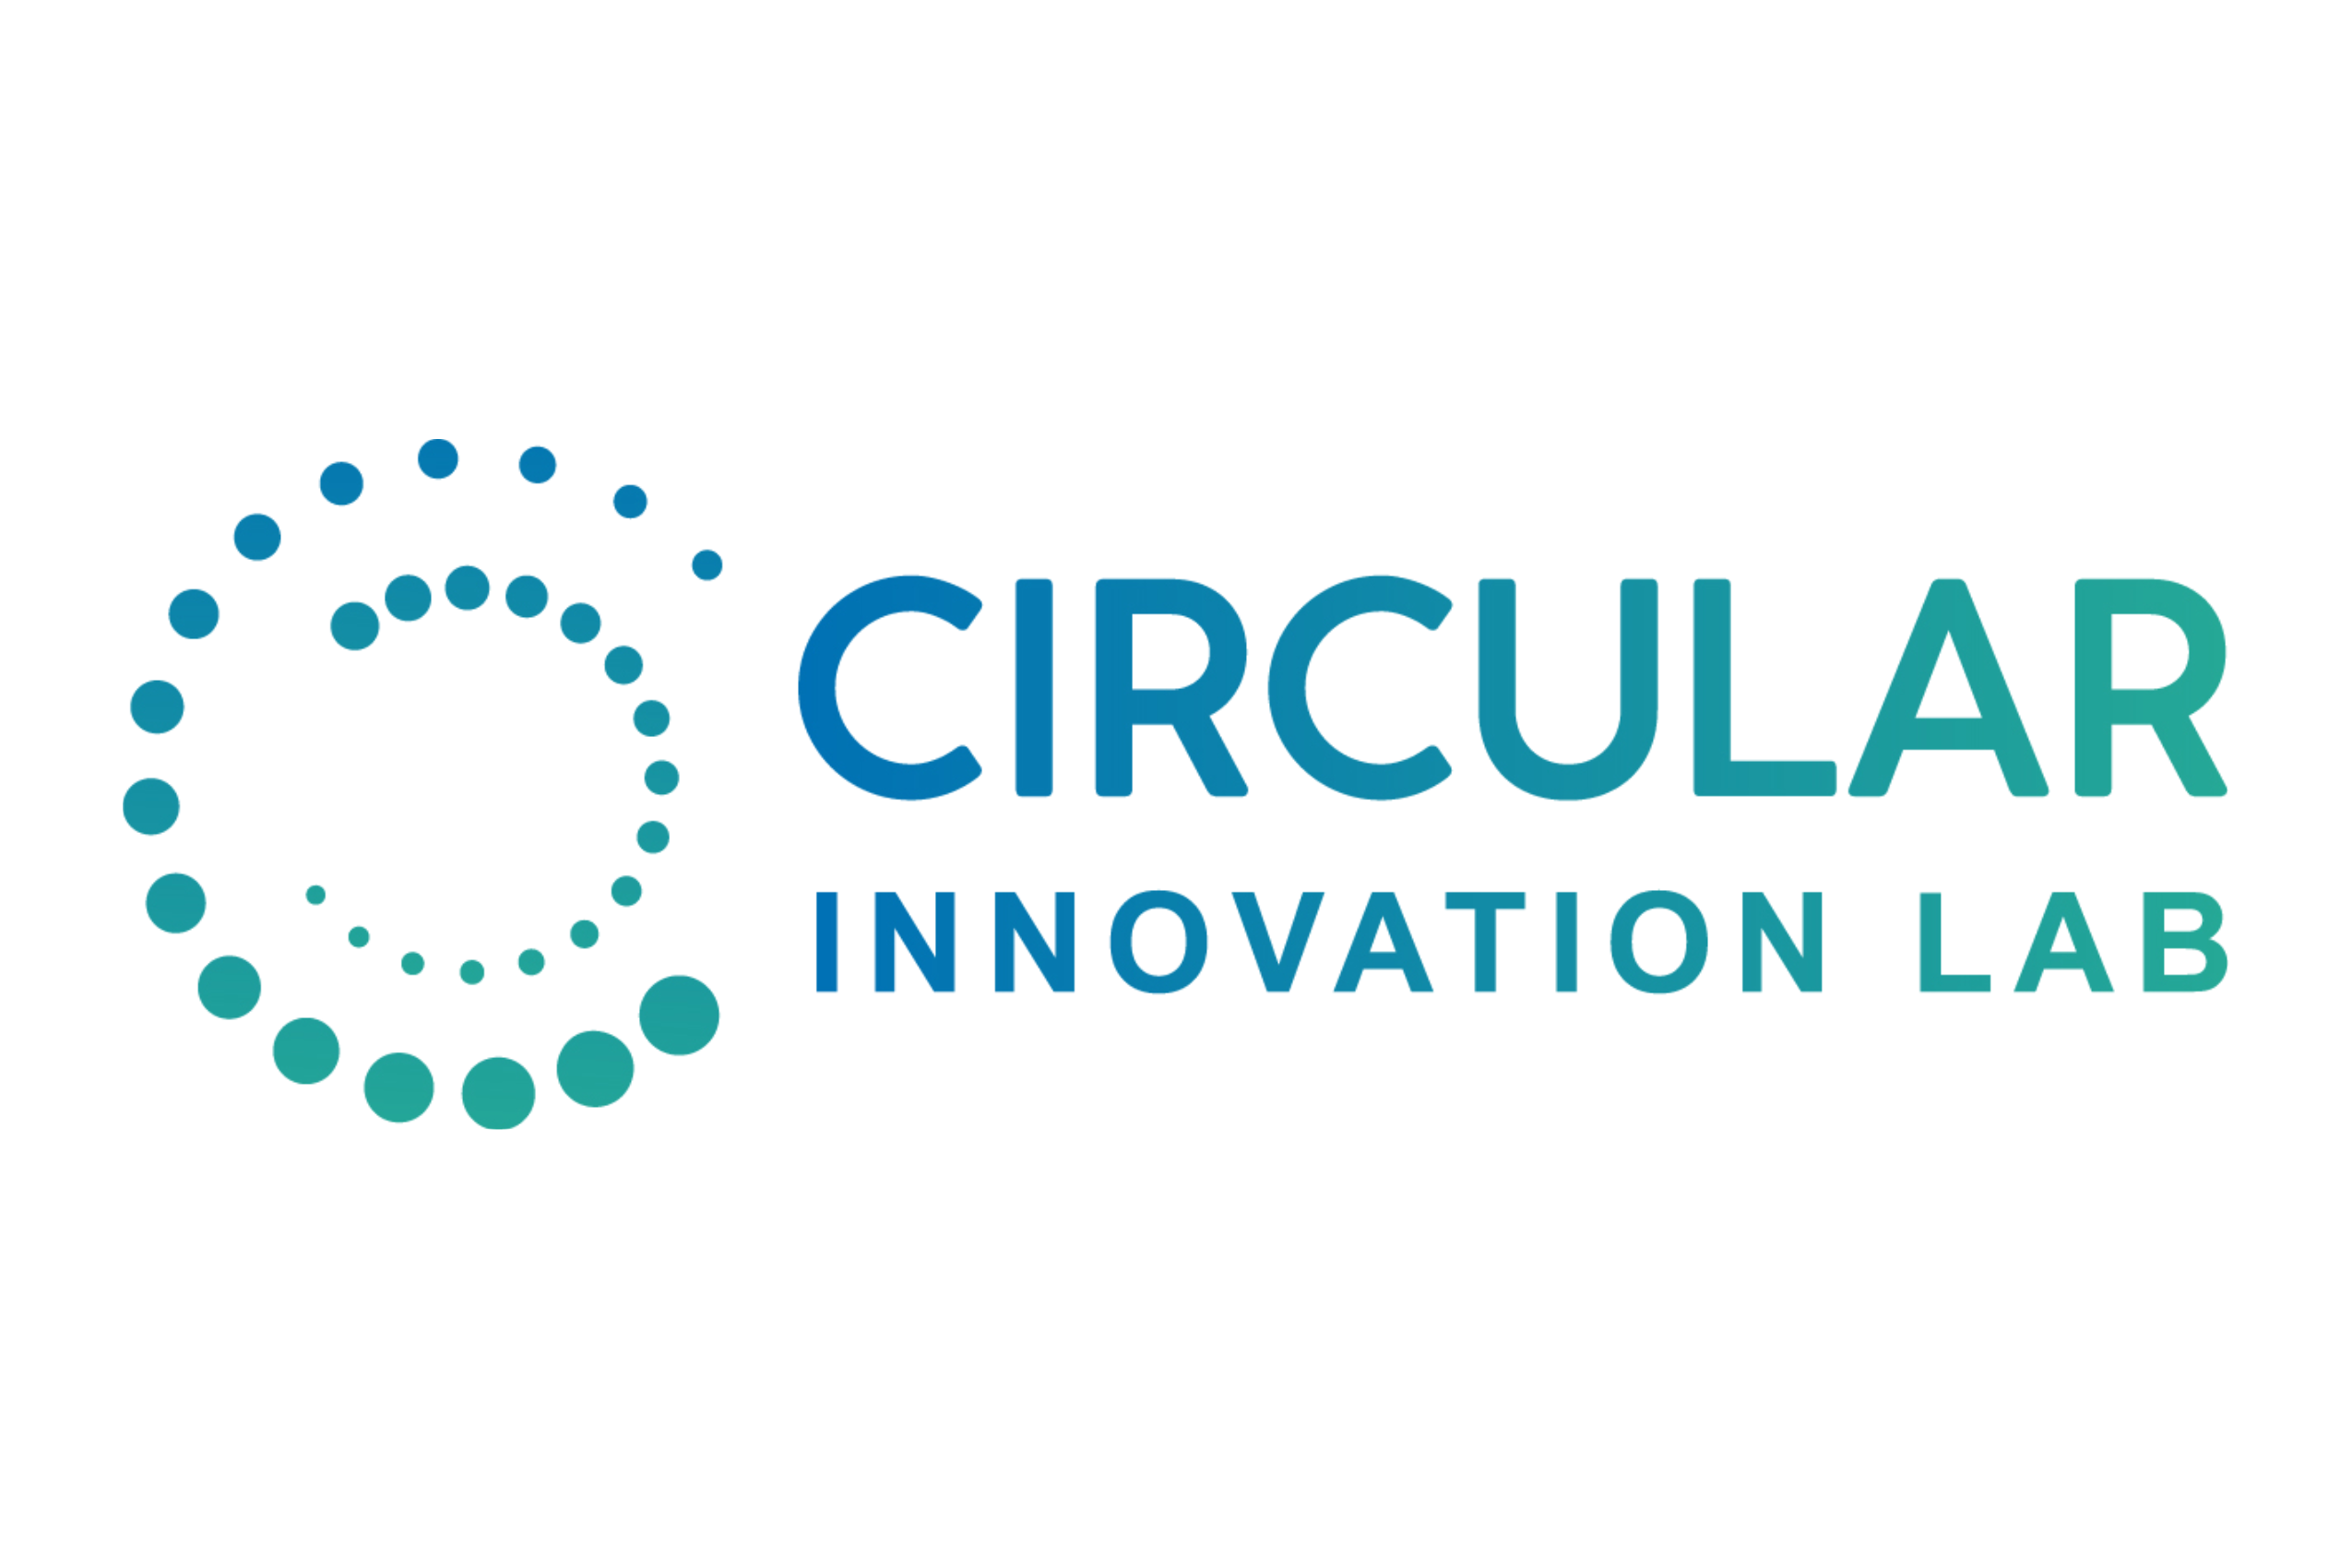 https://europeanplasticspact.org/wp-content/uploads/2021/05/circular-innovation-lab-2.png